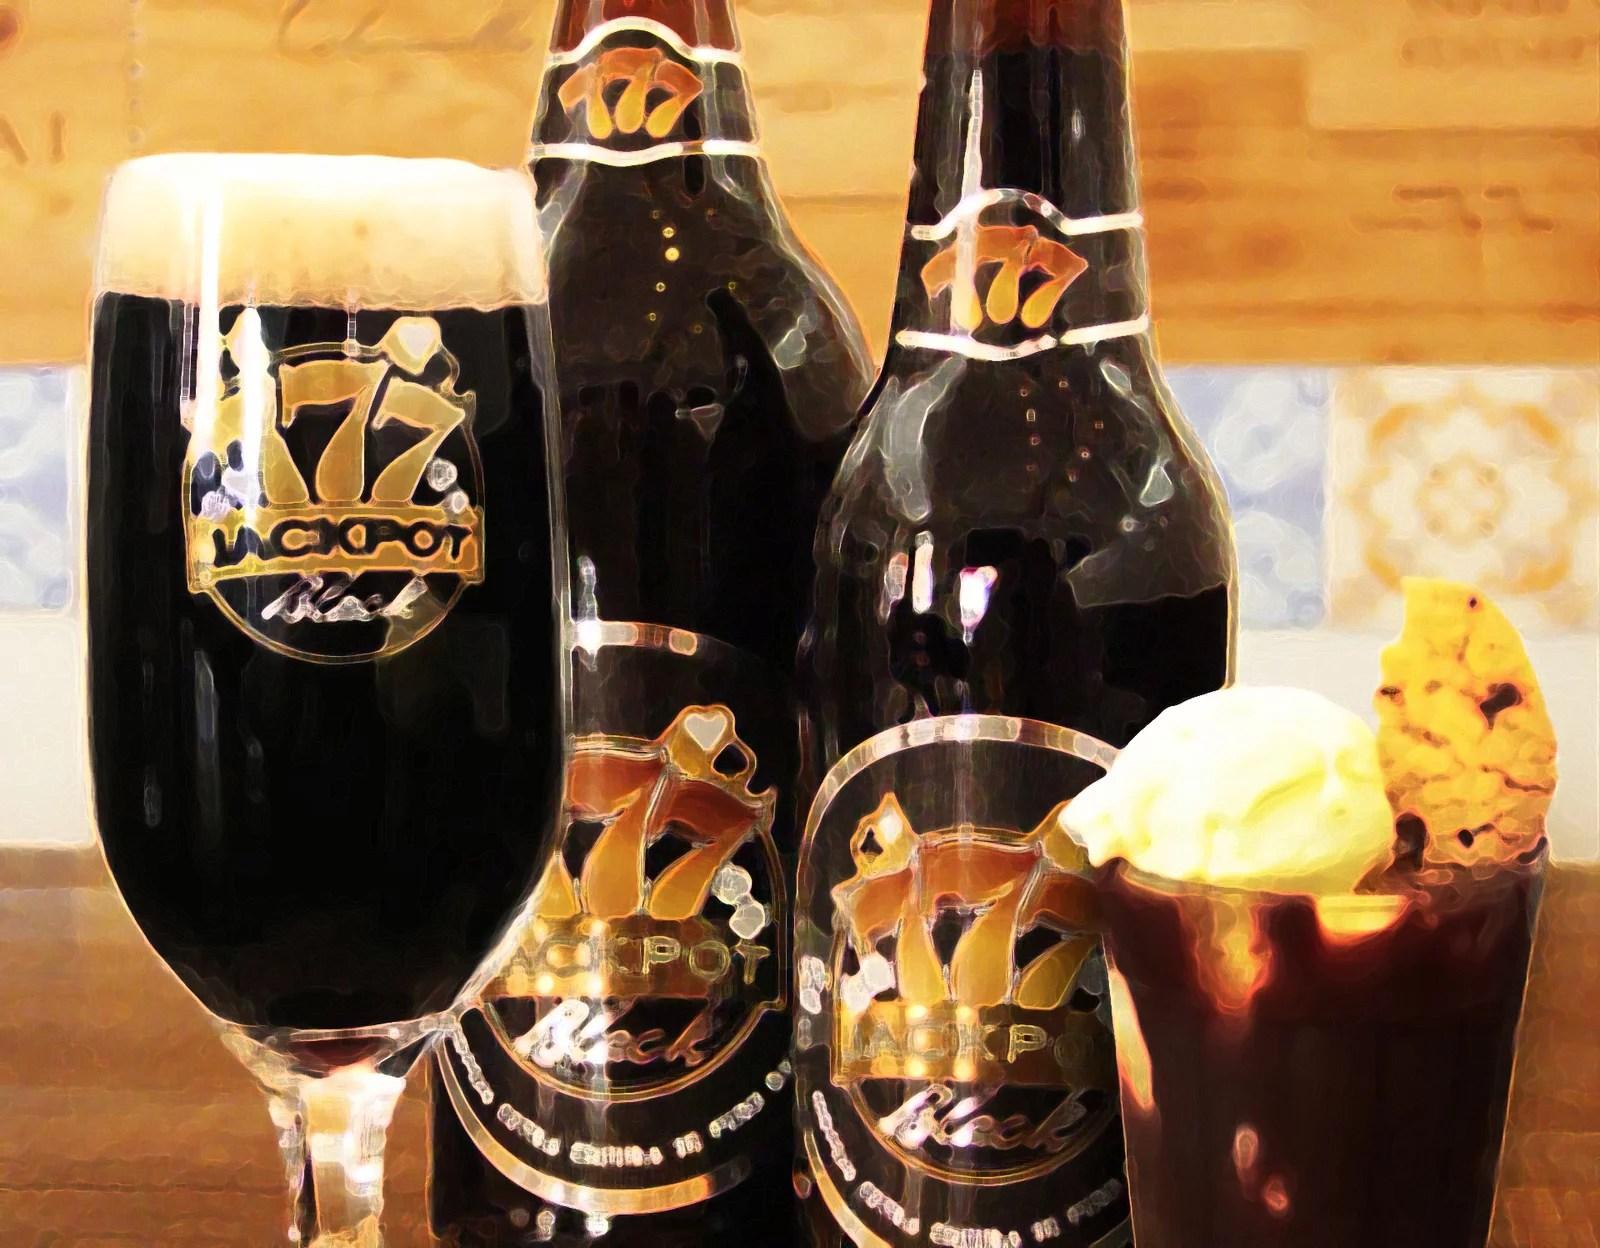 cerveja-blondine-jackpot-black